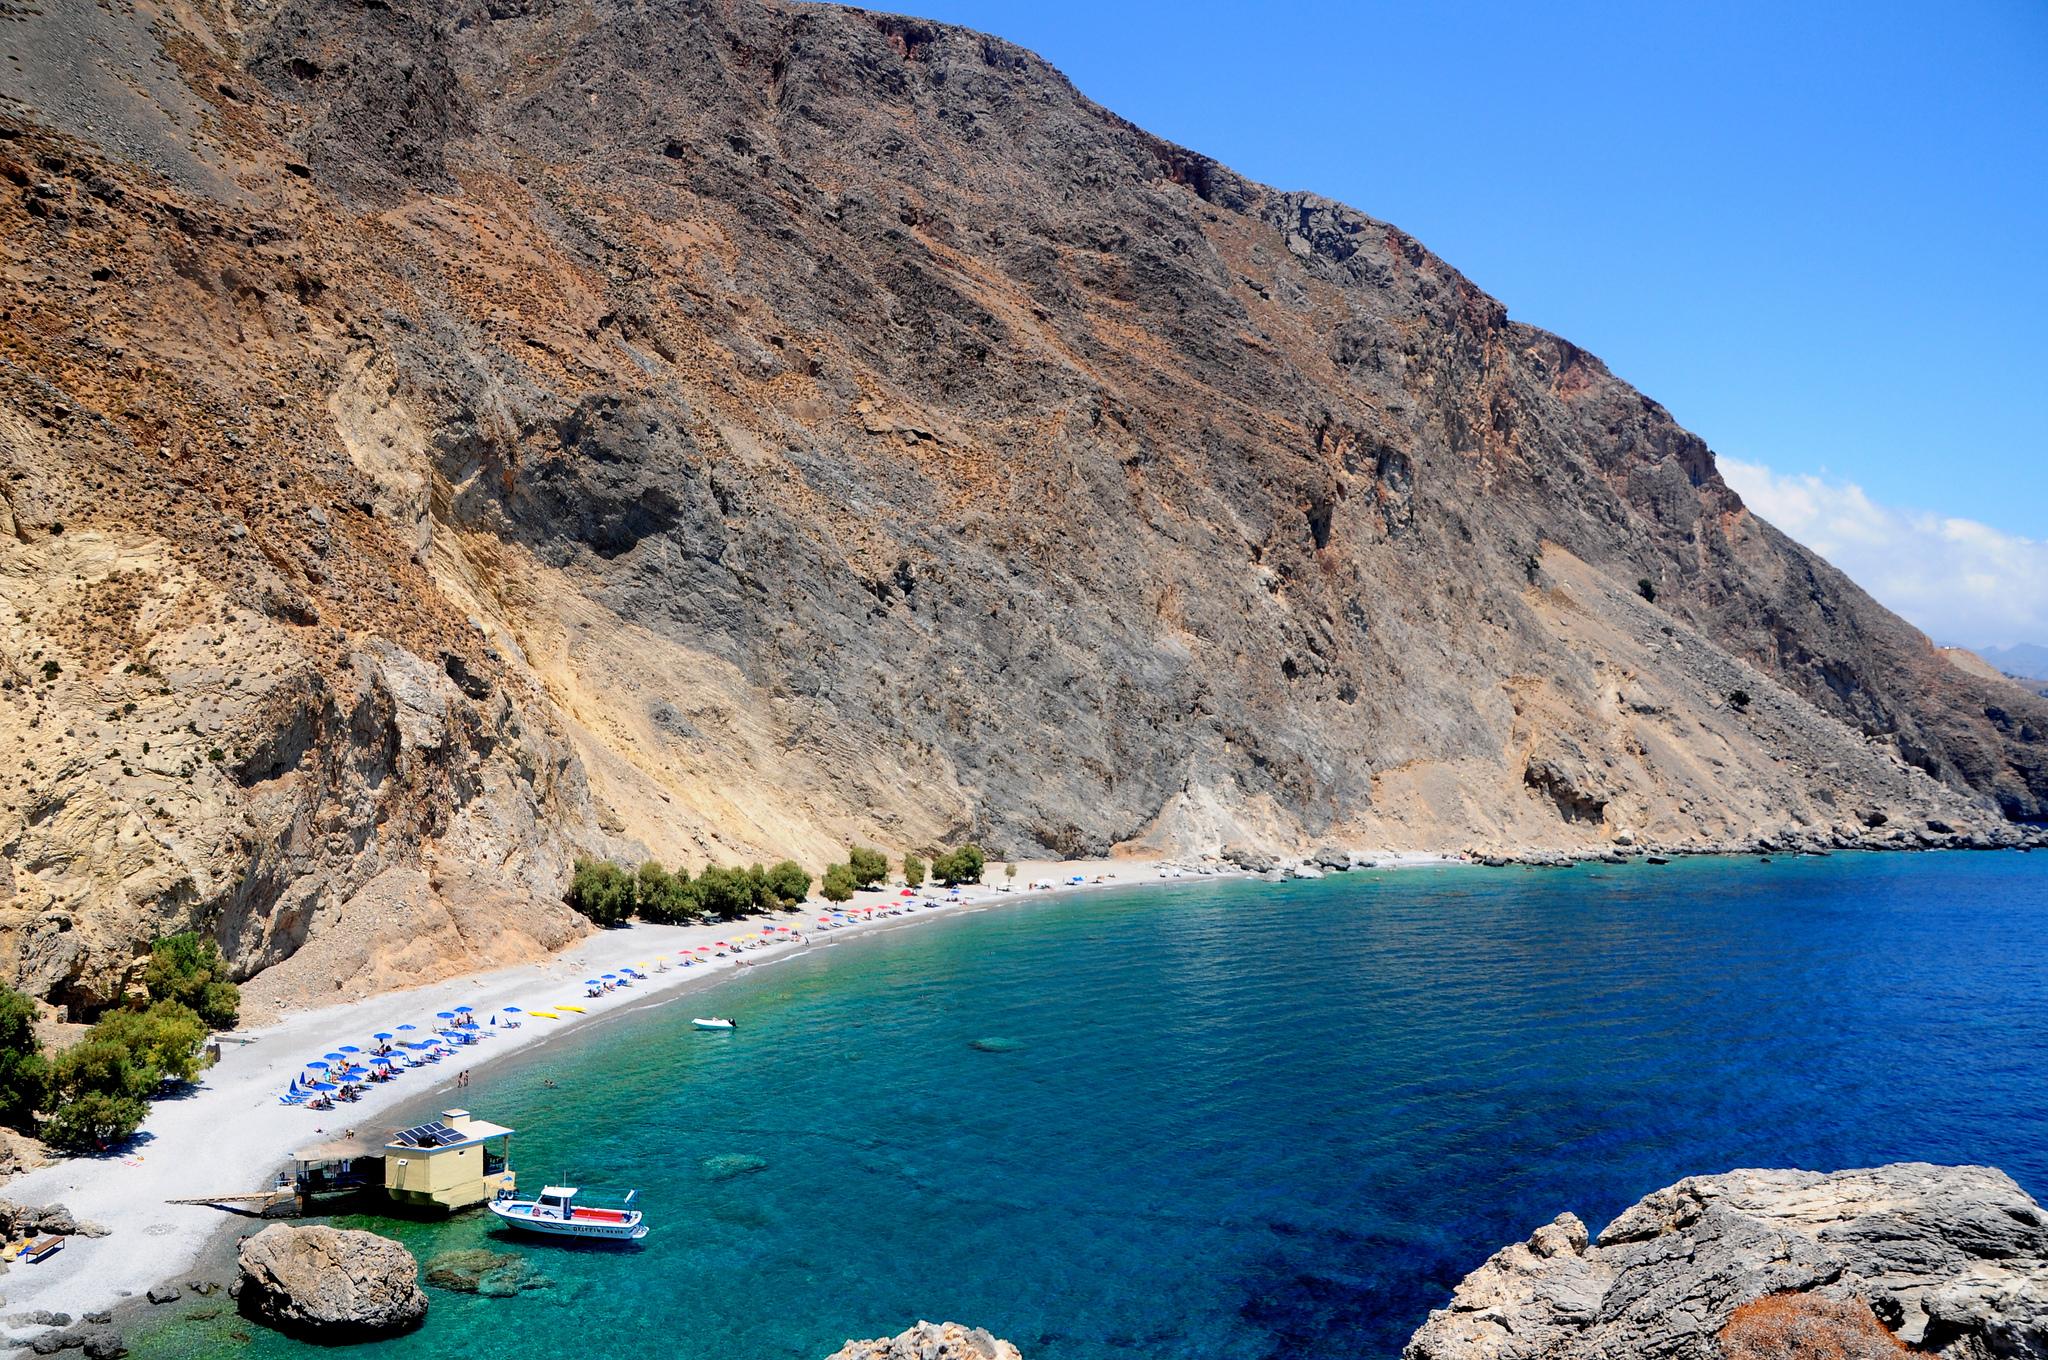 Glyka Nera Beach - Courtesy Panegyrics of Granovetter